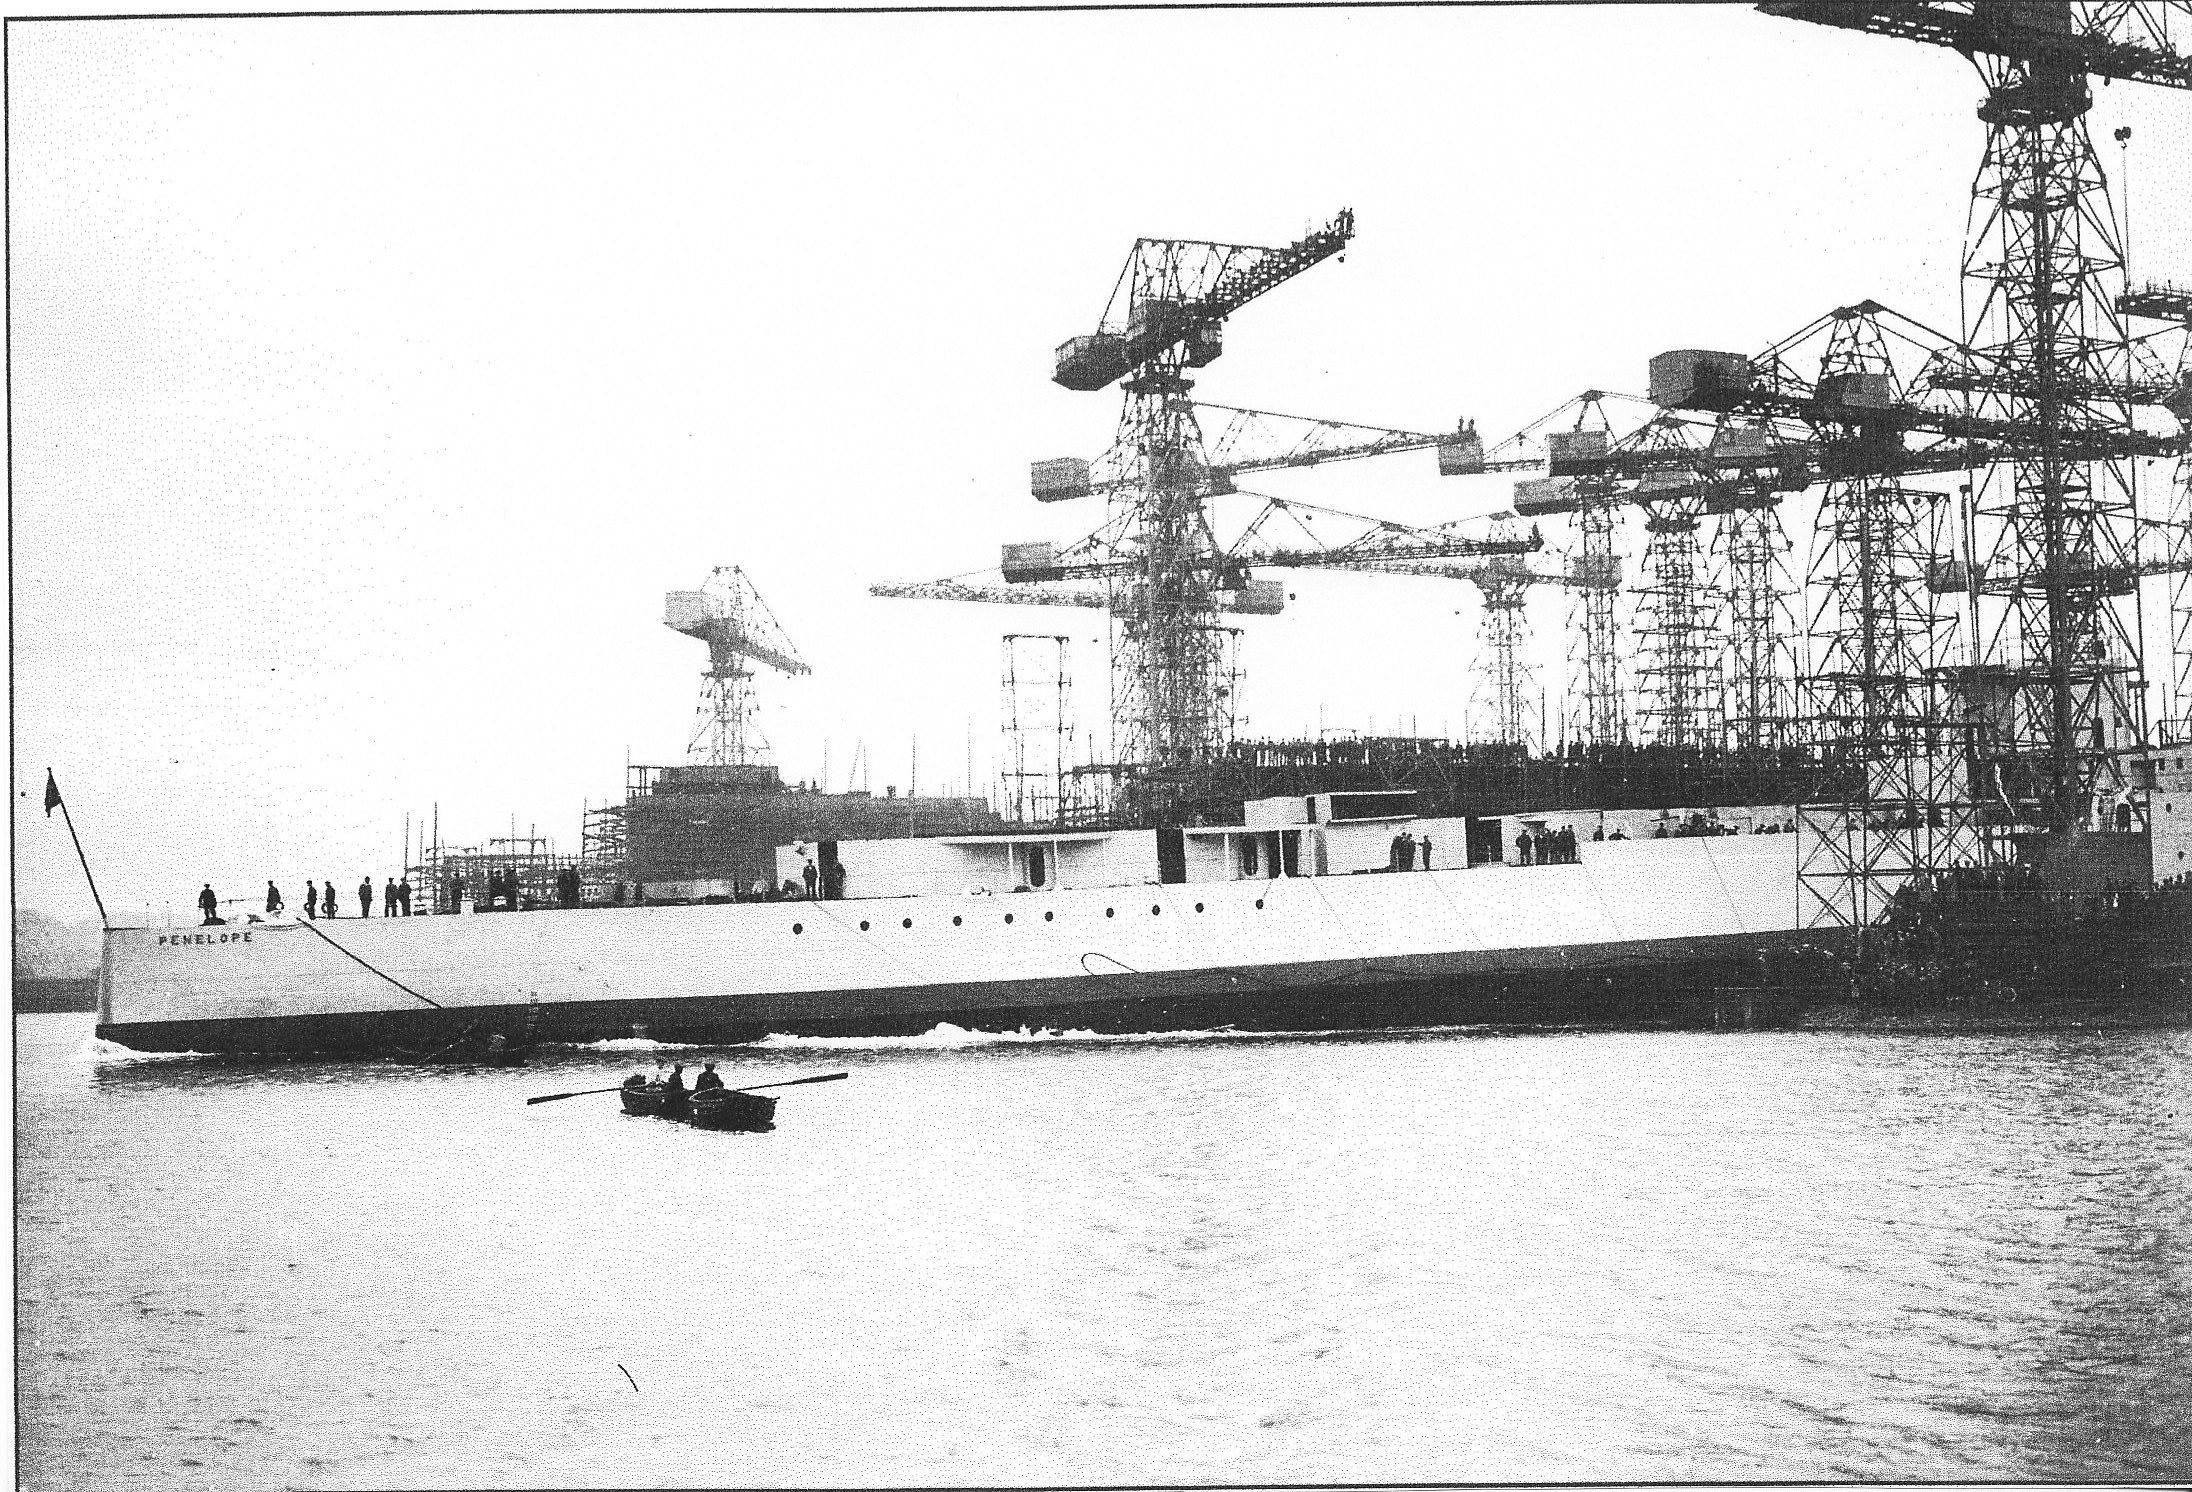 Launch of cruiser Penelope Harland & Wolff Belfast 15 October 1935